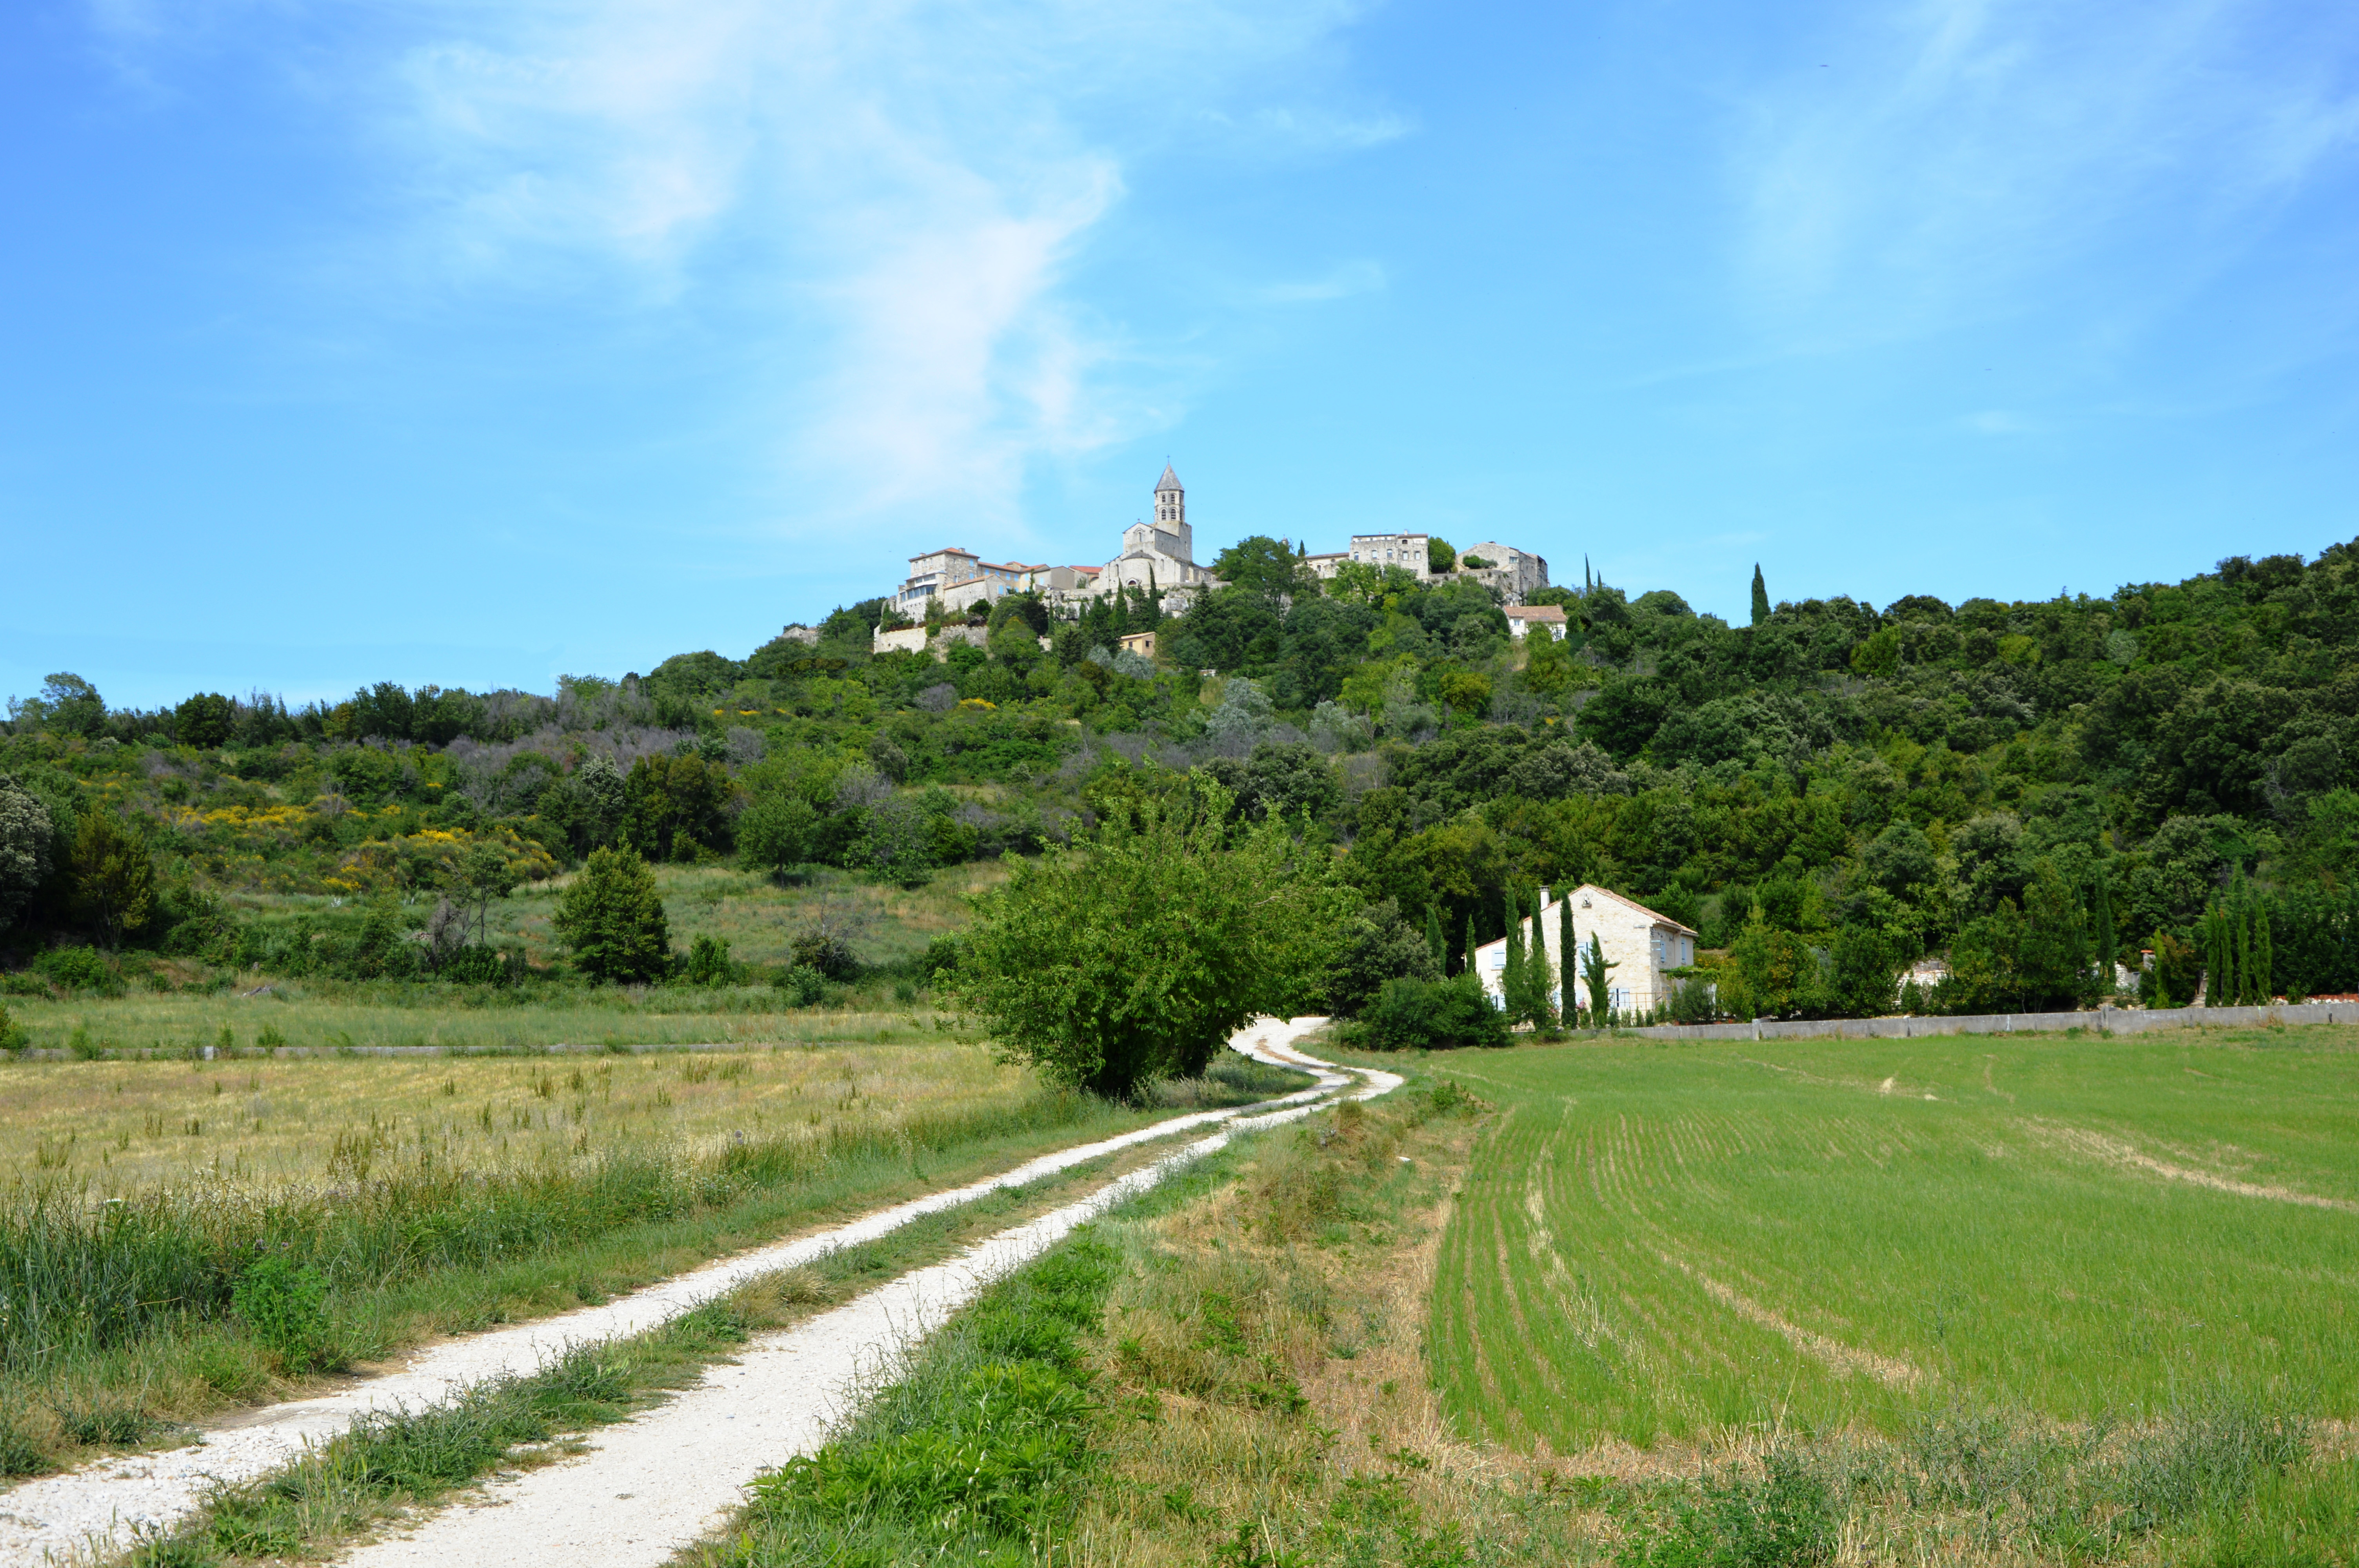 LGA - Syl R - 2019 - OTI vue panoramique village  _8_.JPG